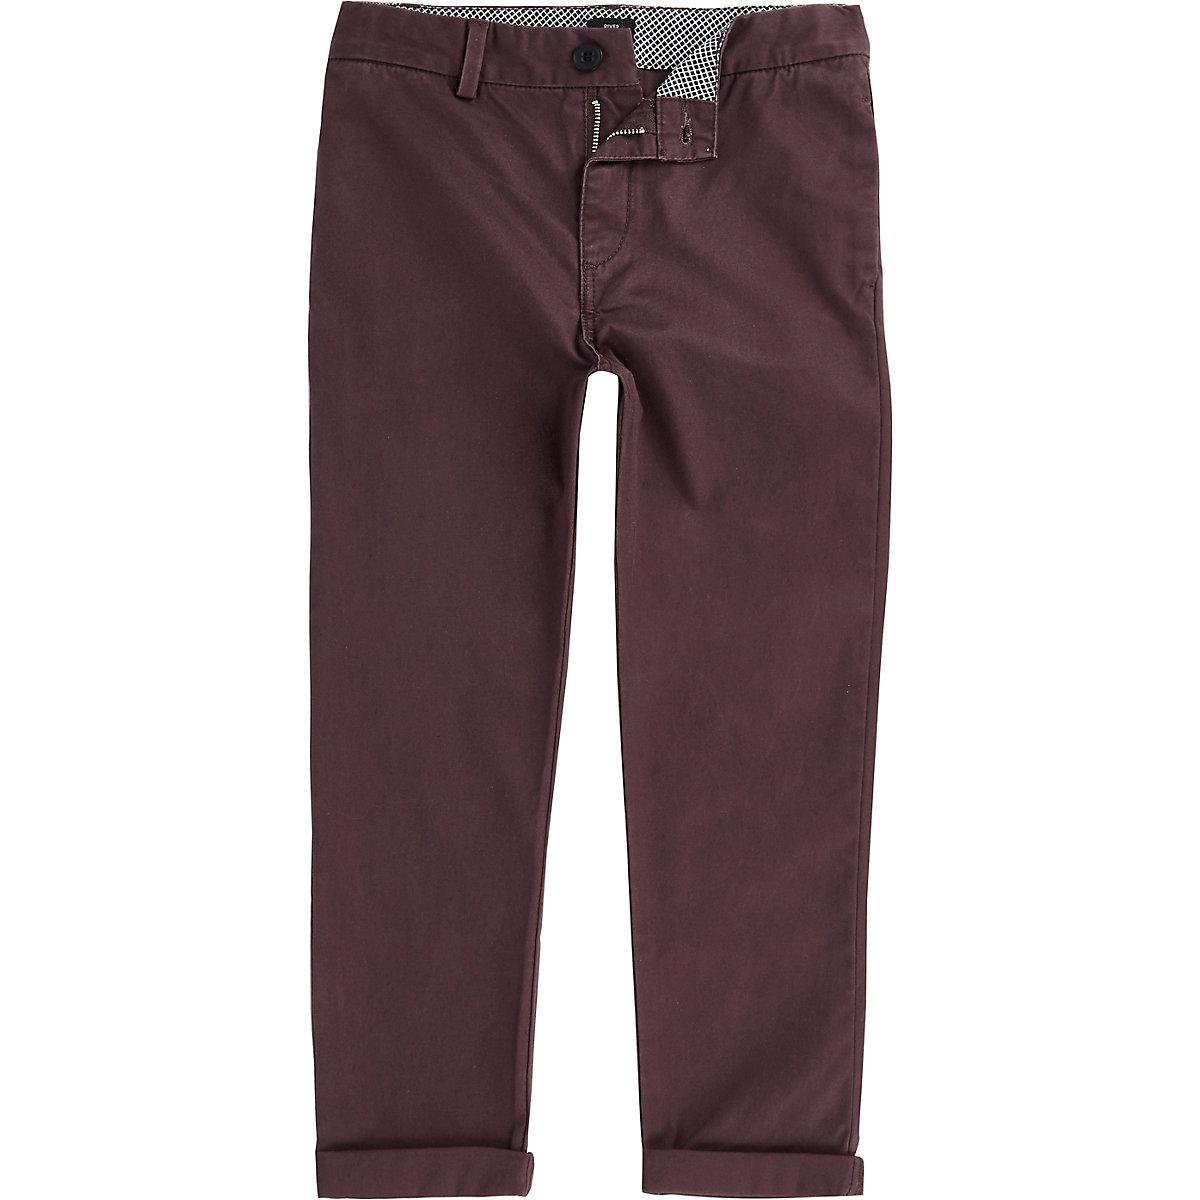 Boys burgundy chino trousers